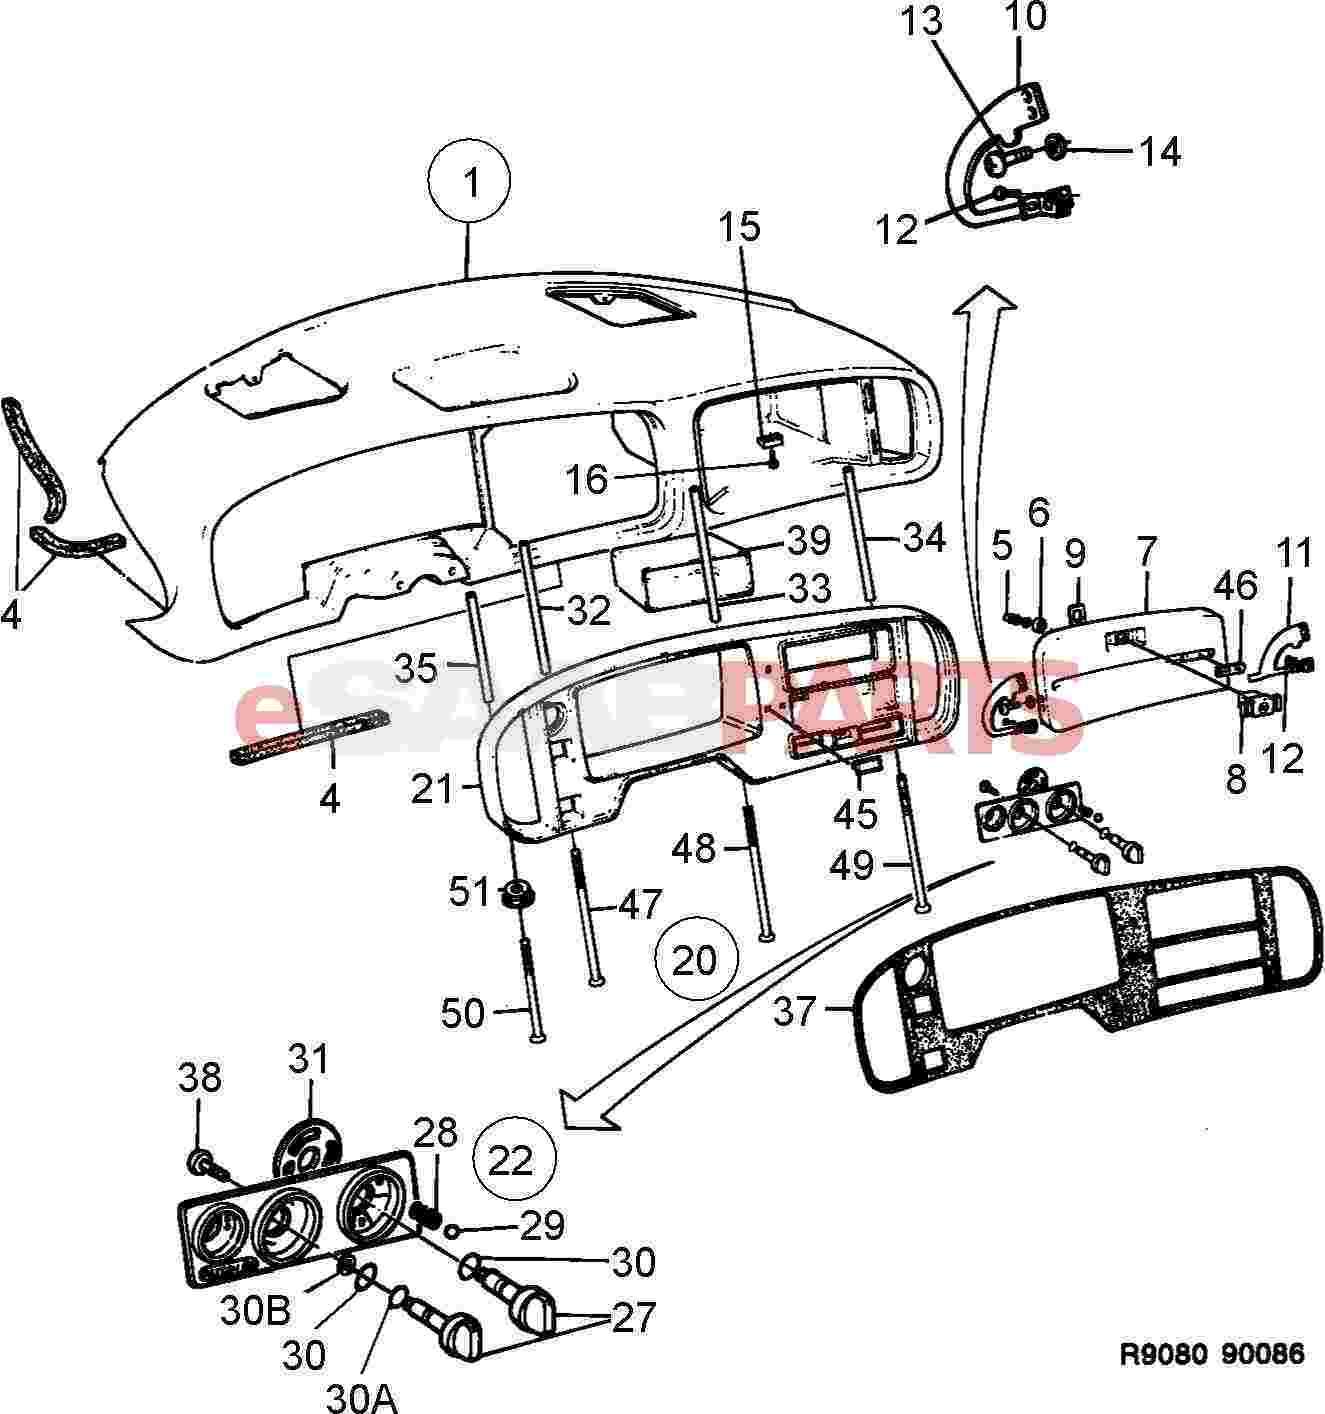 esaabparts com saab 900 \u003e car body internal parts \u003e dashesaabparts com saab 900 \u003e car body internal parts \u003e dash \u0026 related \u003e panel upper instrument plate